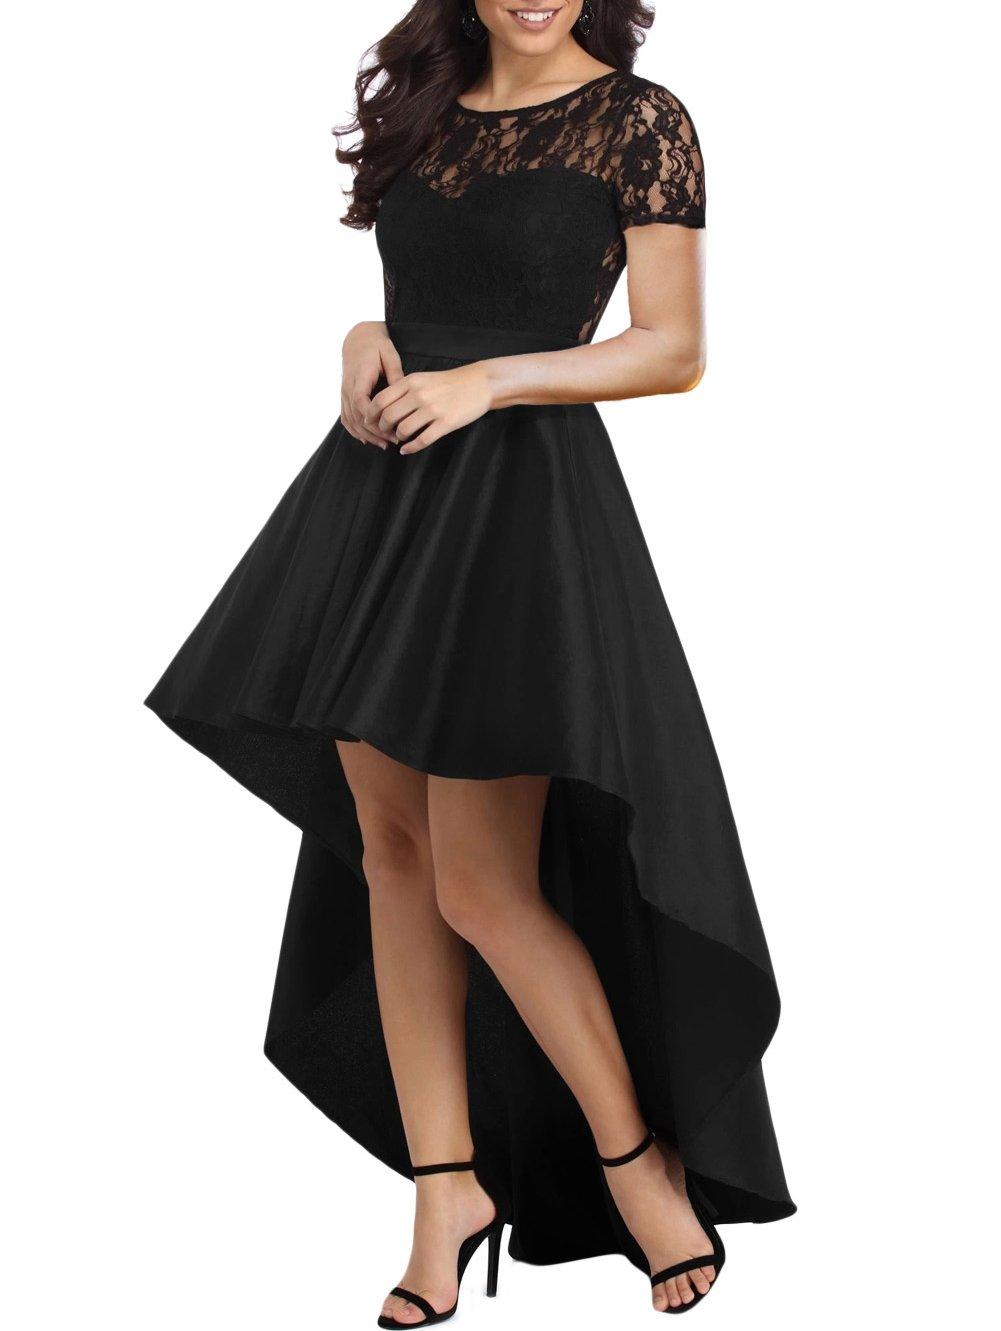 QUEENIE VISCONTI Women Evening Dresses Lace Bodice Elegant Hi-Low Prom Party Dress Black